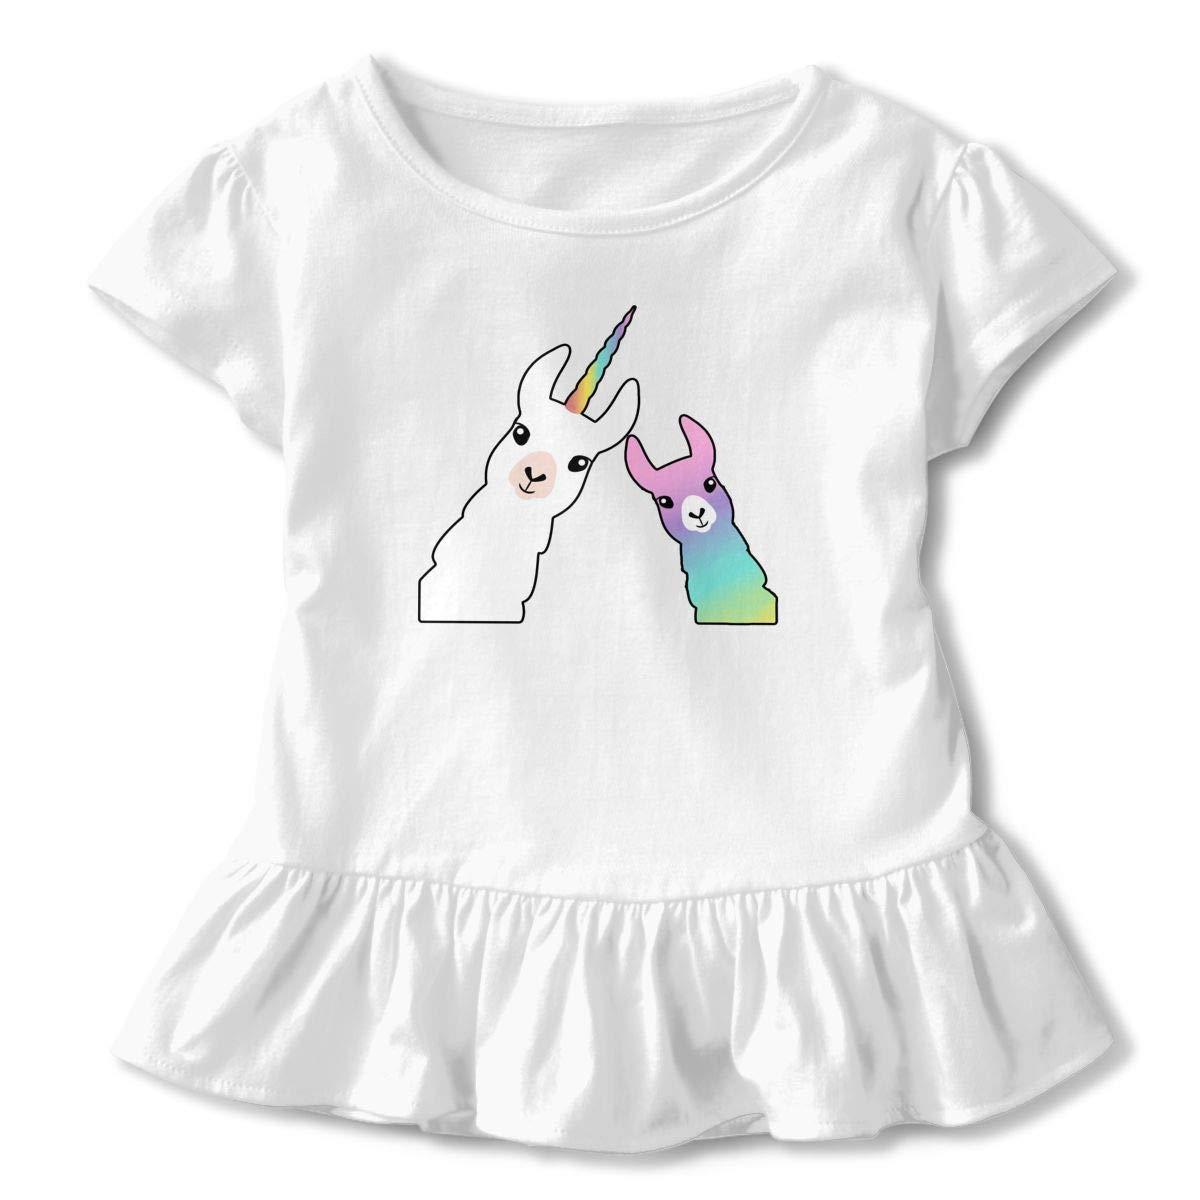 Cute Unicorn Llama Alpaca Toddler Baby Girls Cotton Ruffle Short Sleeve Top Soft T-Shirt 2-6T